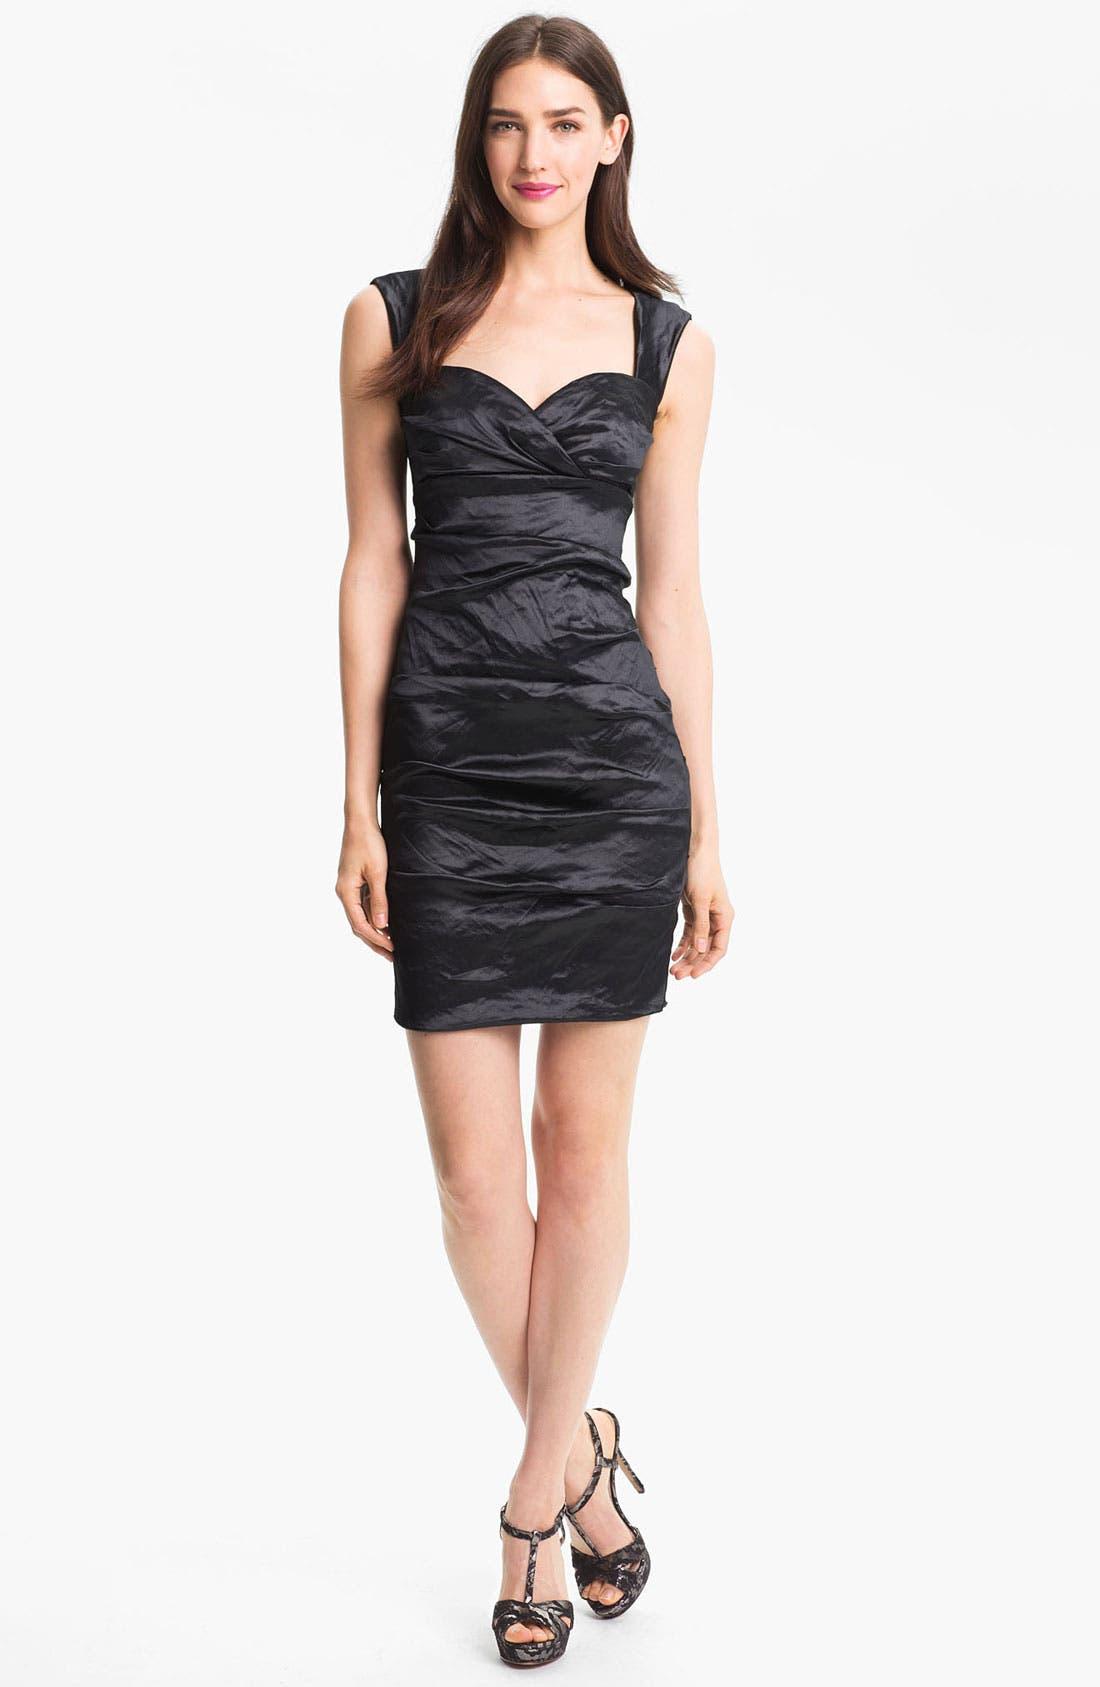 Alternate Image 1 Selected - Nicole Miller Techno Metal Faille Sheath Dress